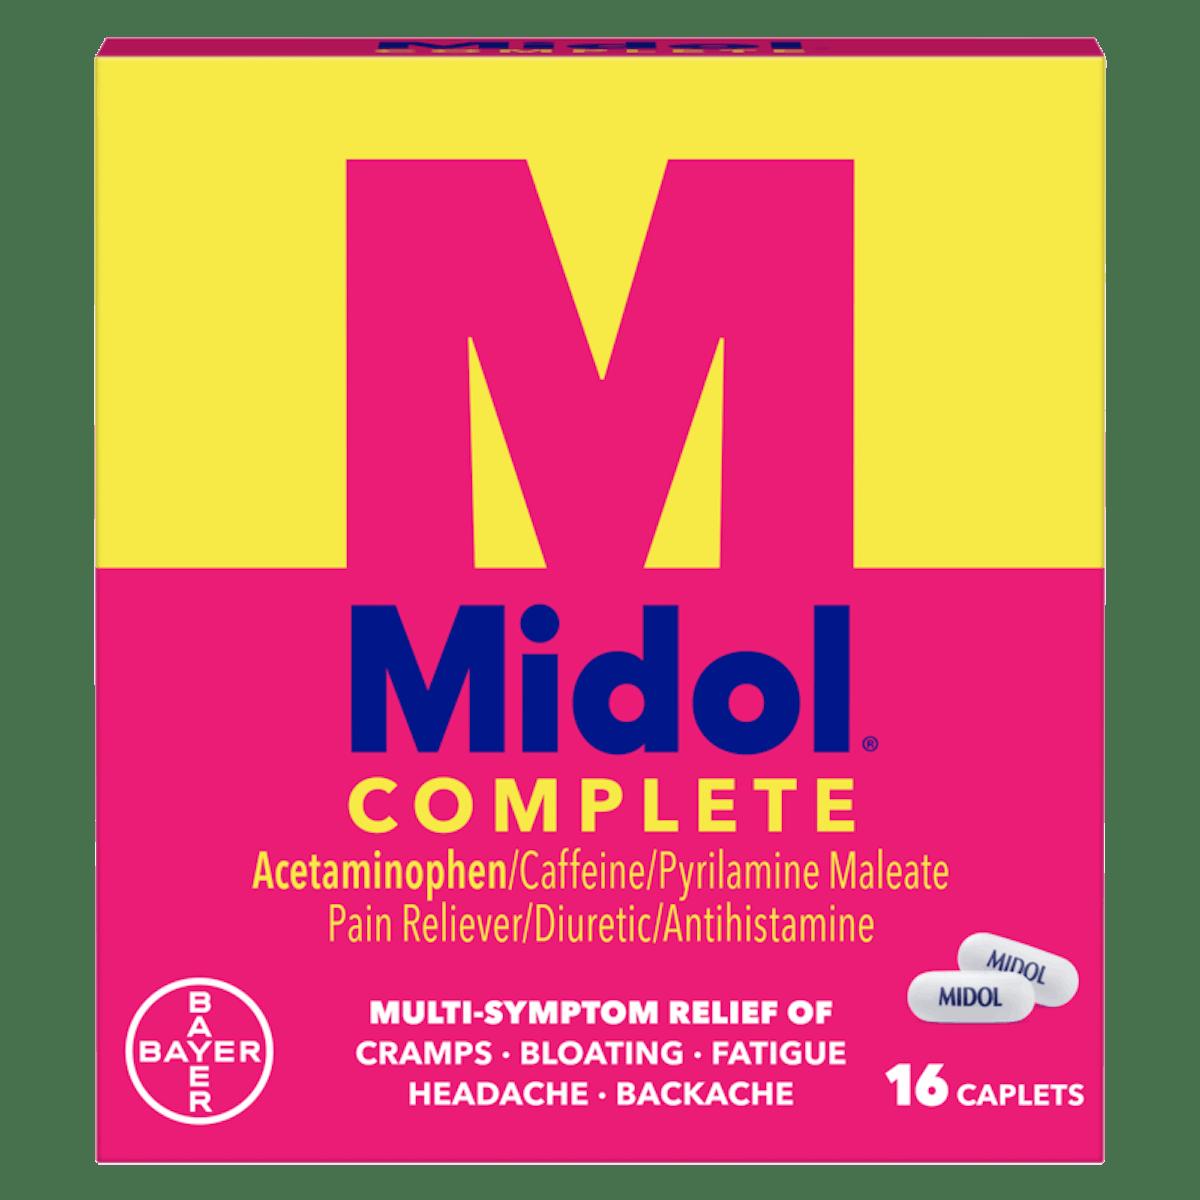 Midol® Complete